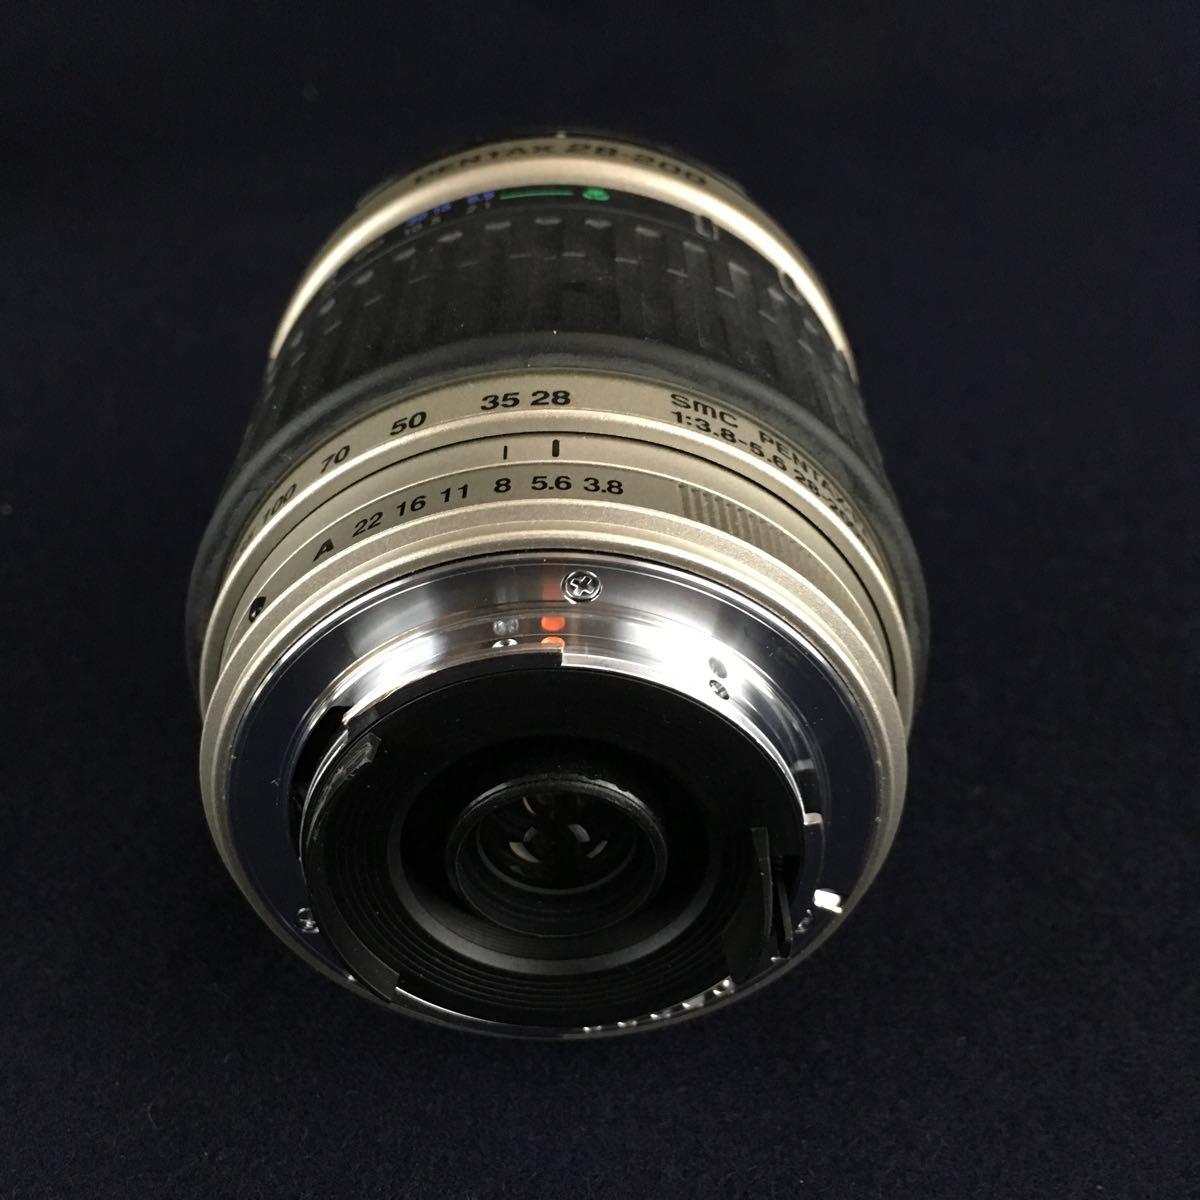 PENTAX-FA 43mm 1.9 Limited / FA 28-200mm 3.8-5.6 オートフォーカスレンズ2点_画像4